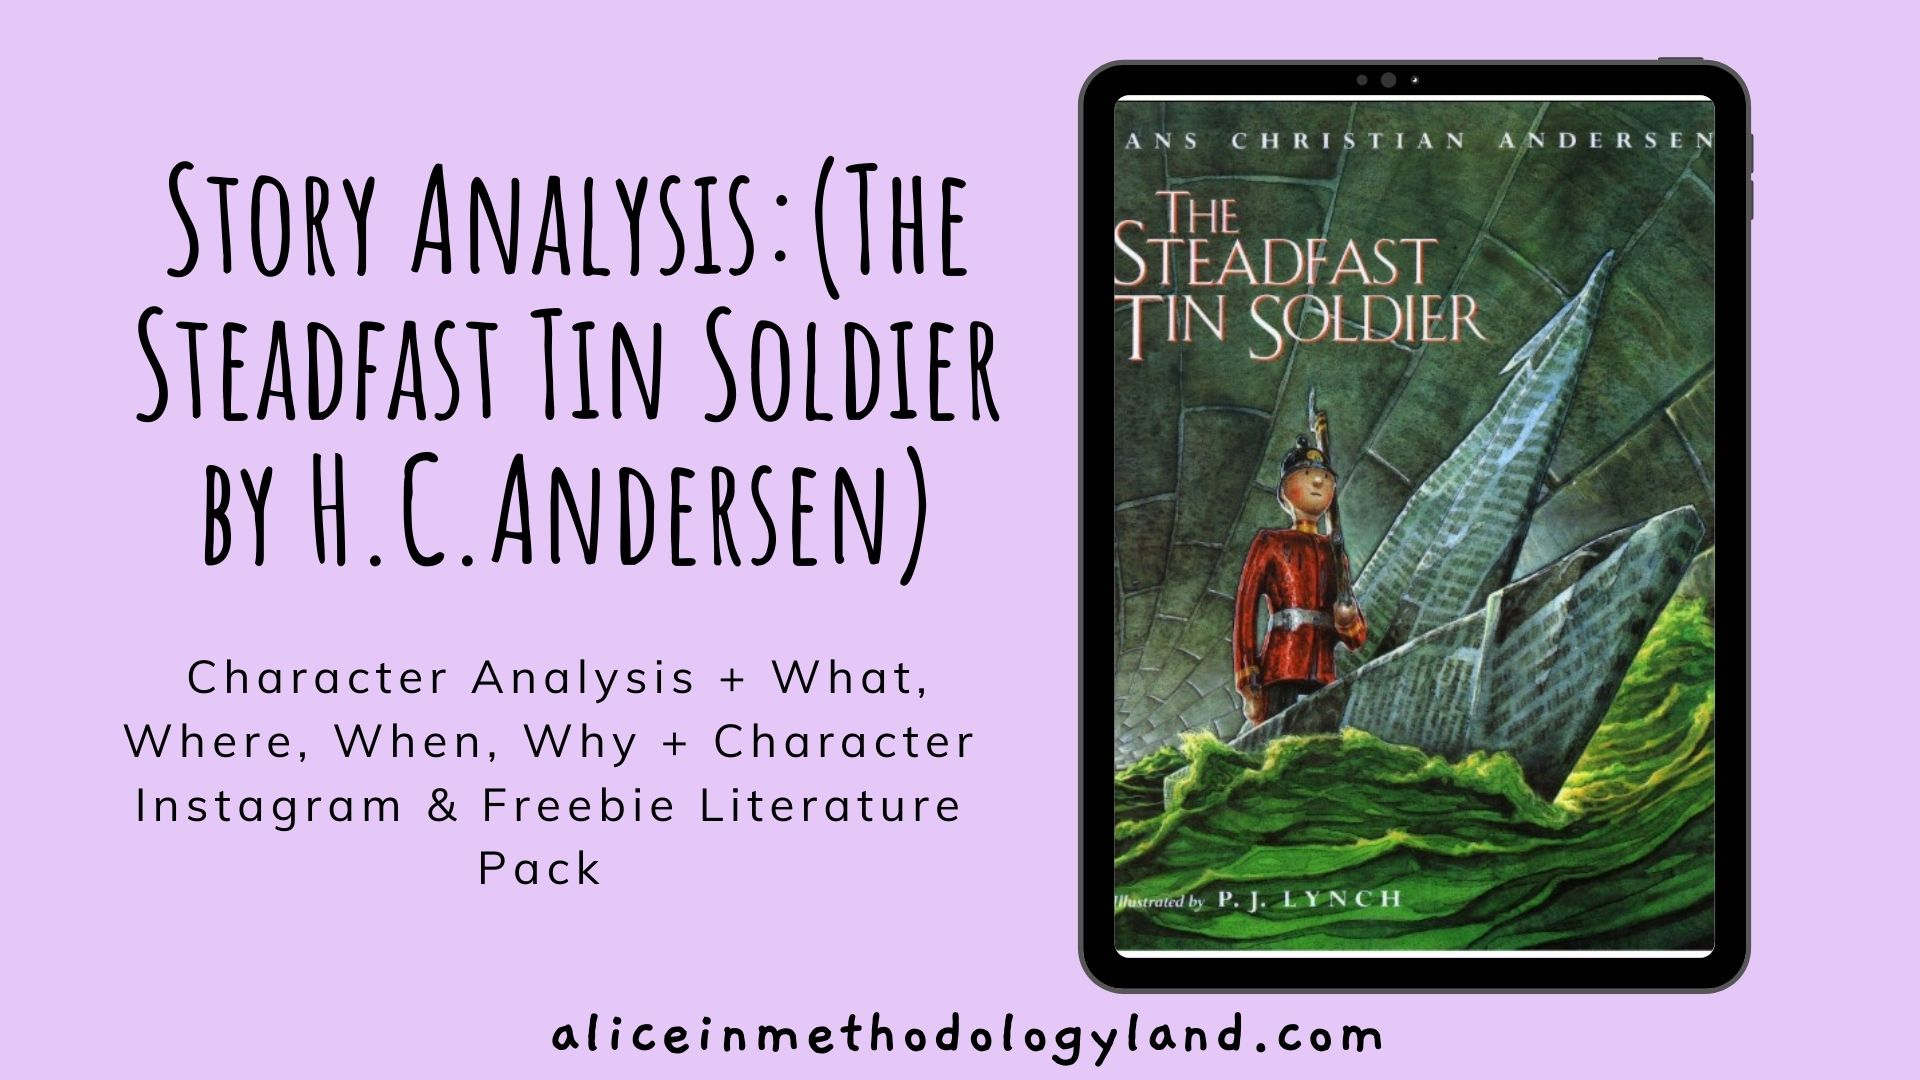 The Steadfast Tin Soldier by H.C.Andersen Activities + Literature Analysis Freebies!